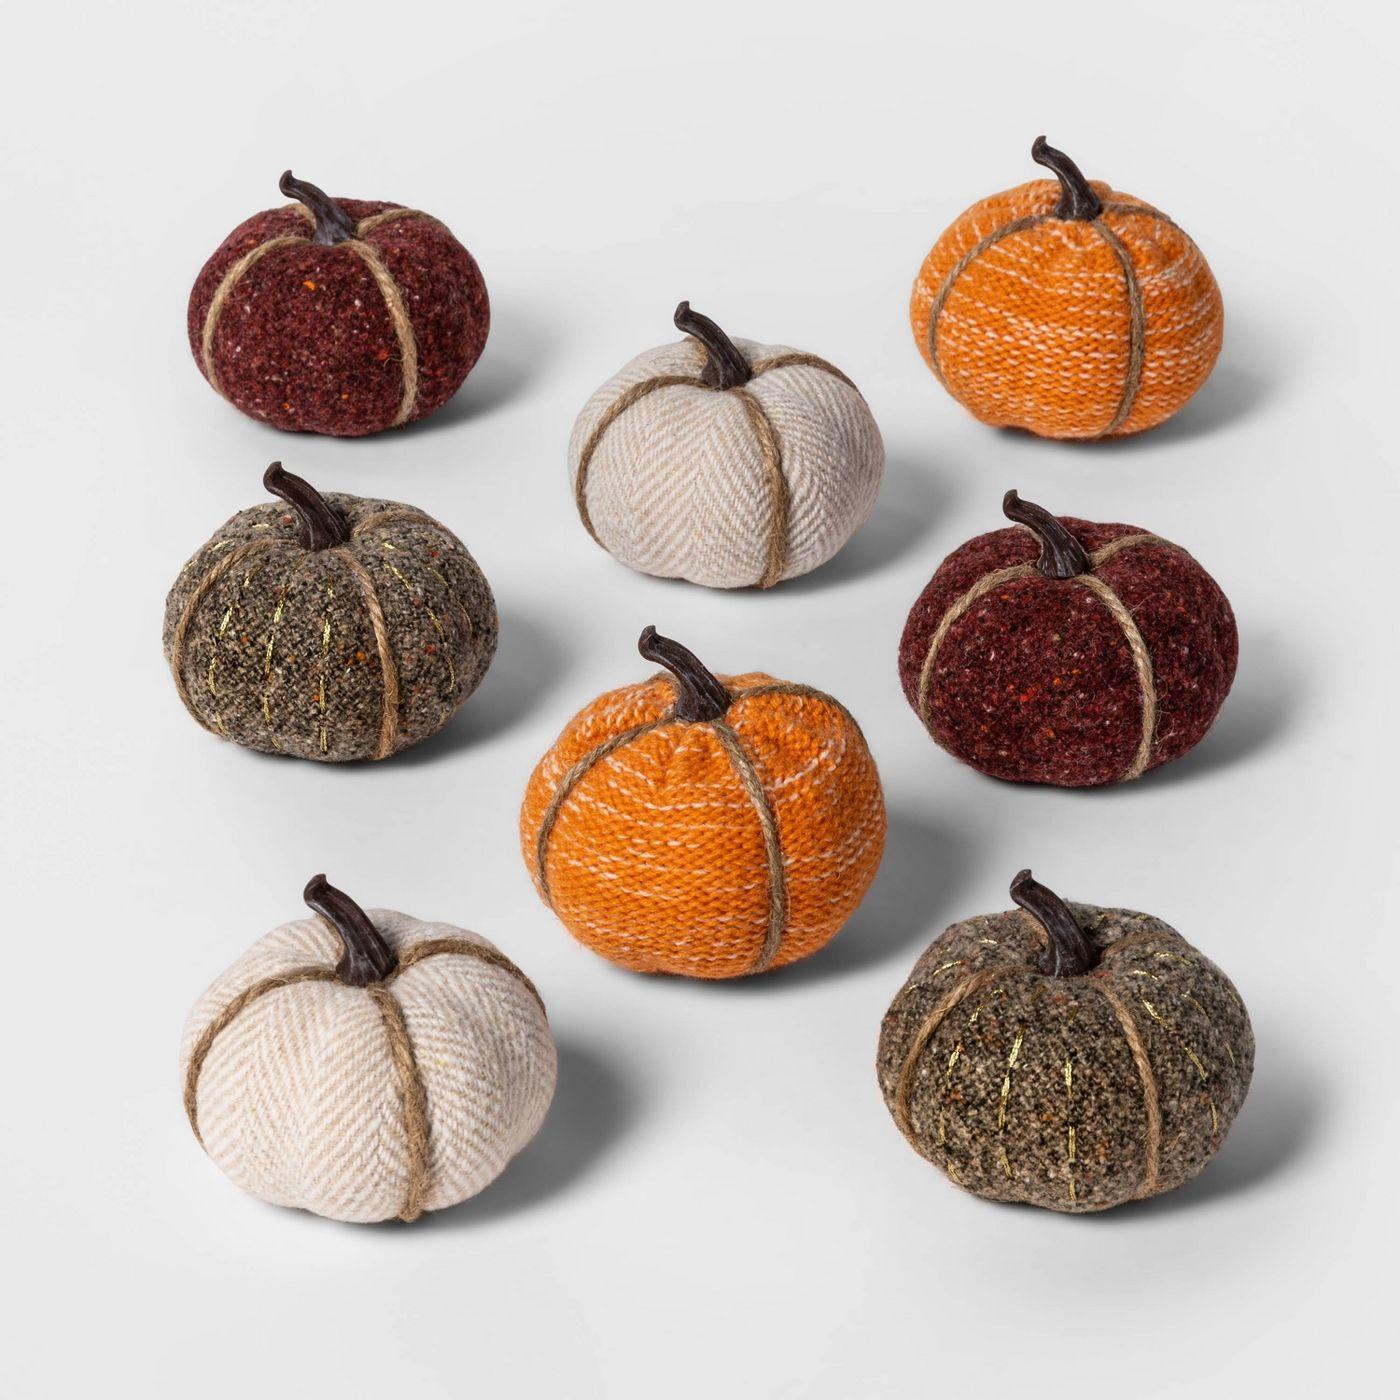 8ct Mini Fabric Pumpkins Halloween Decoration Solid - Spritz™ - image 1 of 2